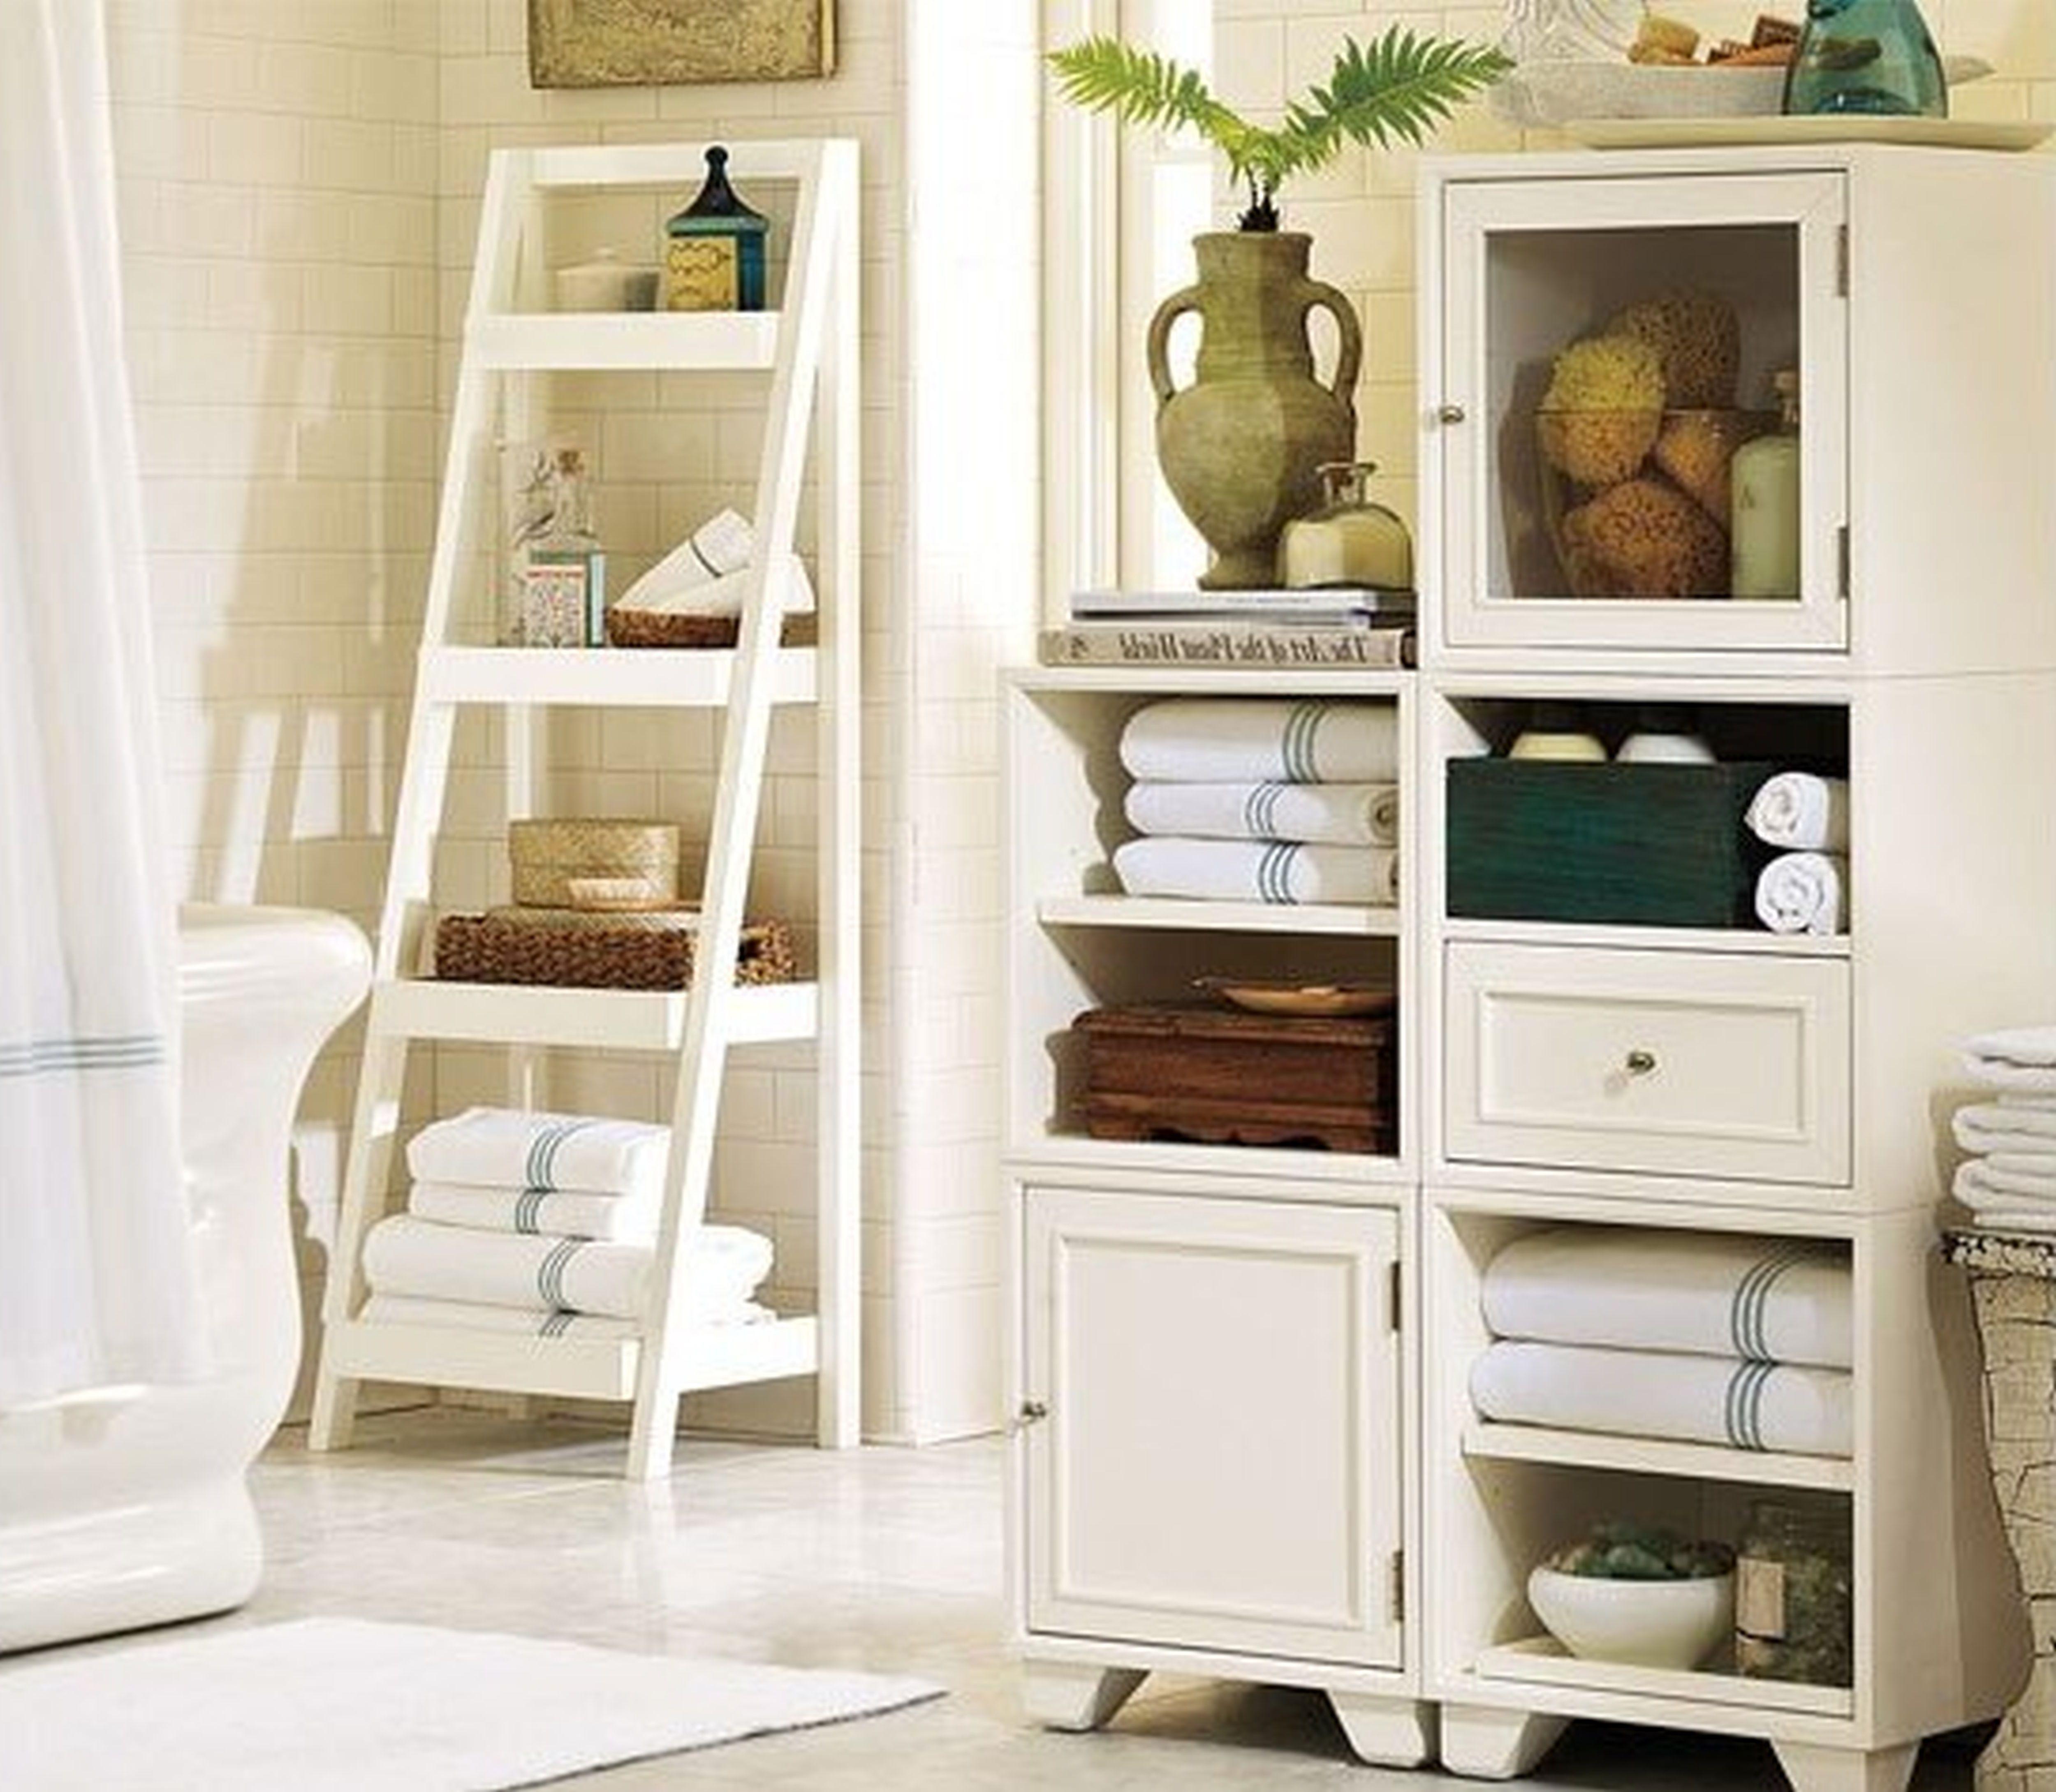 Bathroom Storage Ideas for Small Bathroom | Bathroom | Pinterest ...